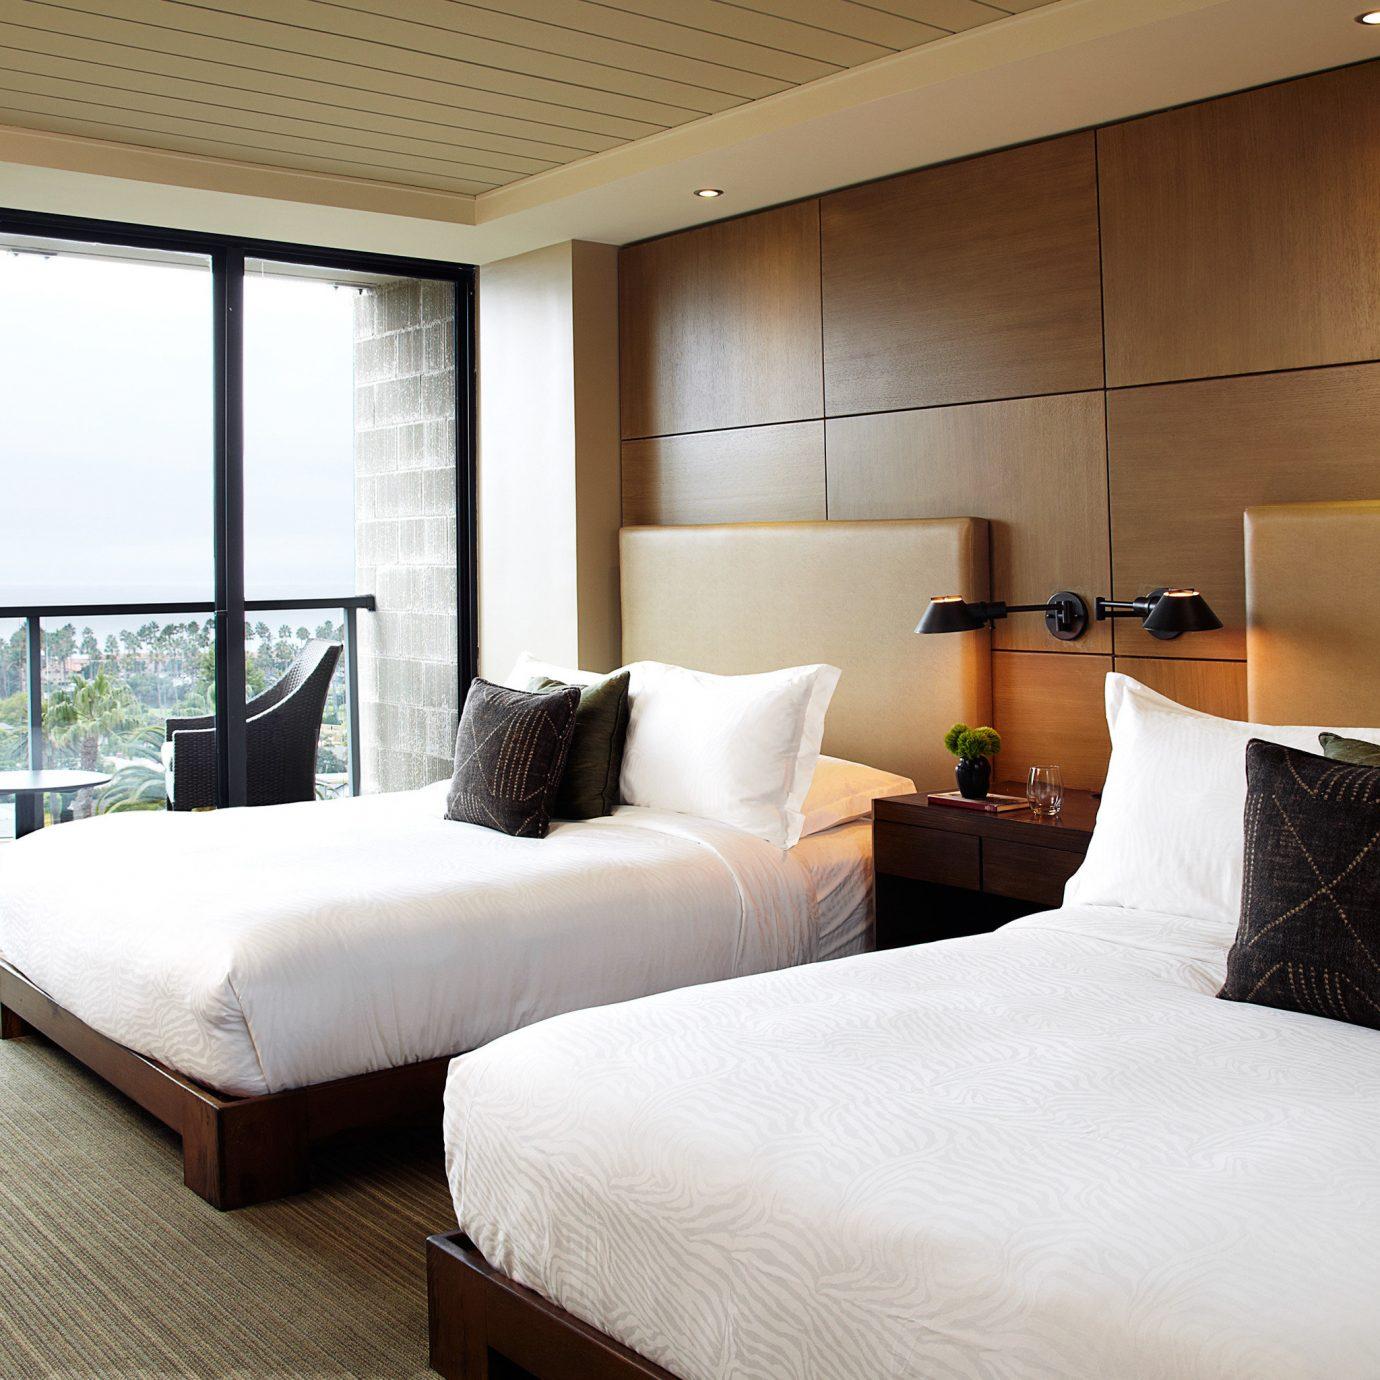 Balcony Bedroom Hip Hotels Trip Ideas property Suite condominium living room nice cottage